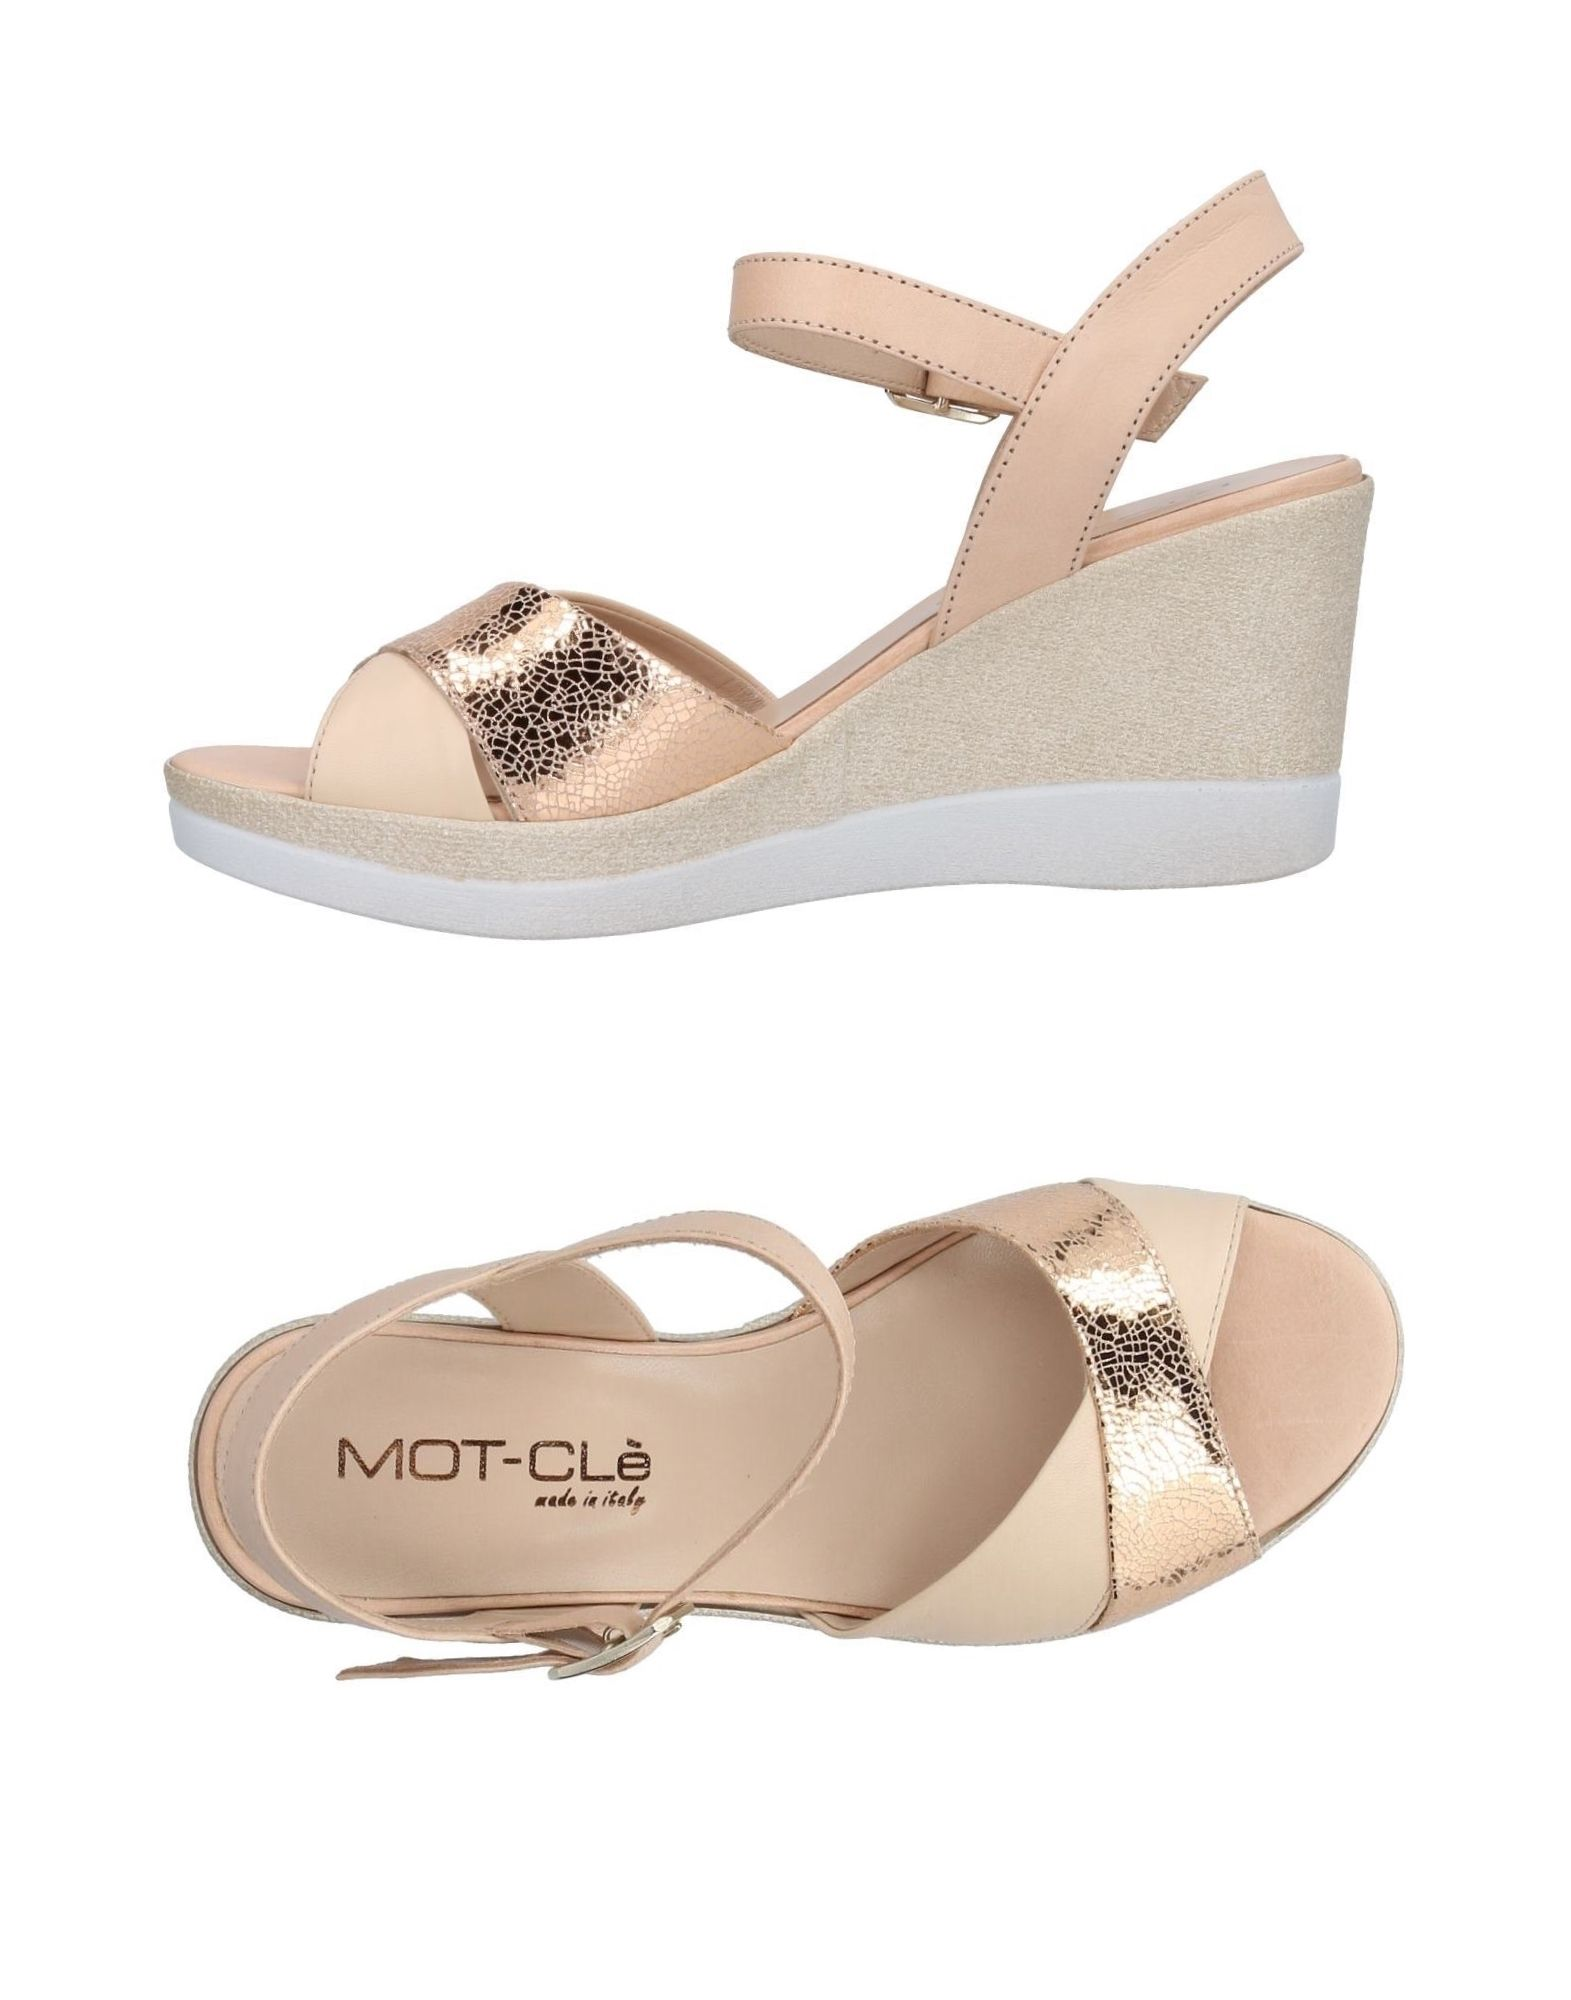 Moda Sandali Mot-Clè Donna - 11410513FF 11410513FF - ef8b45